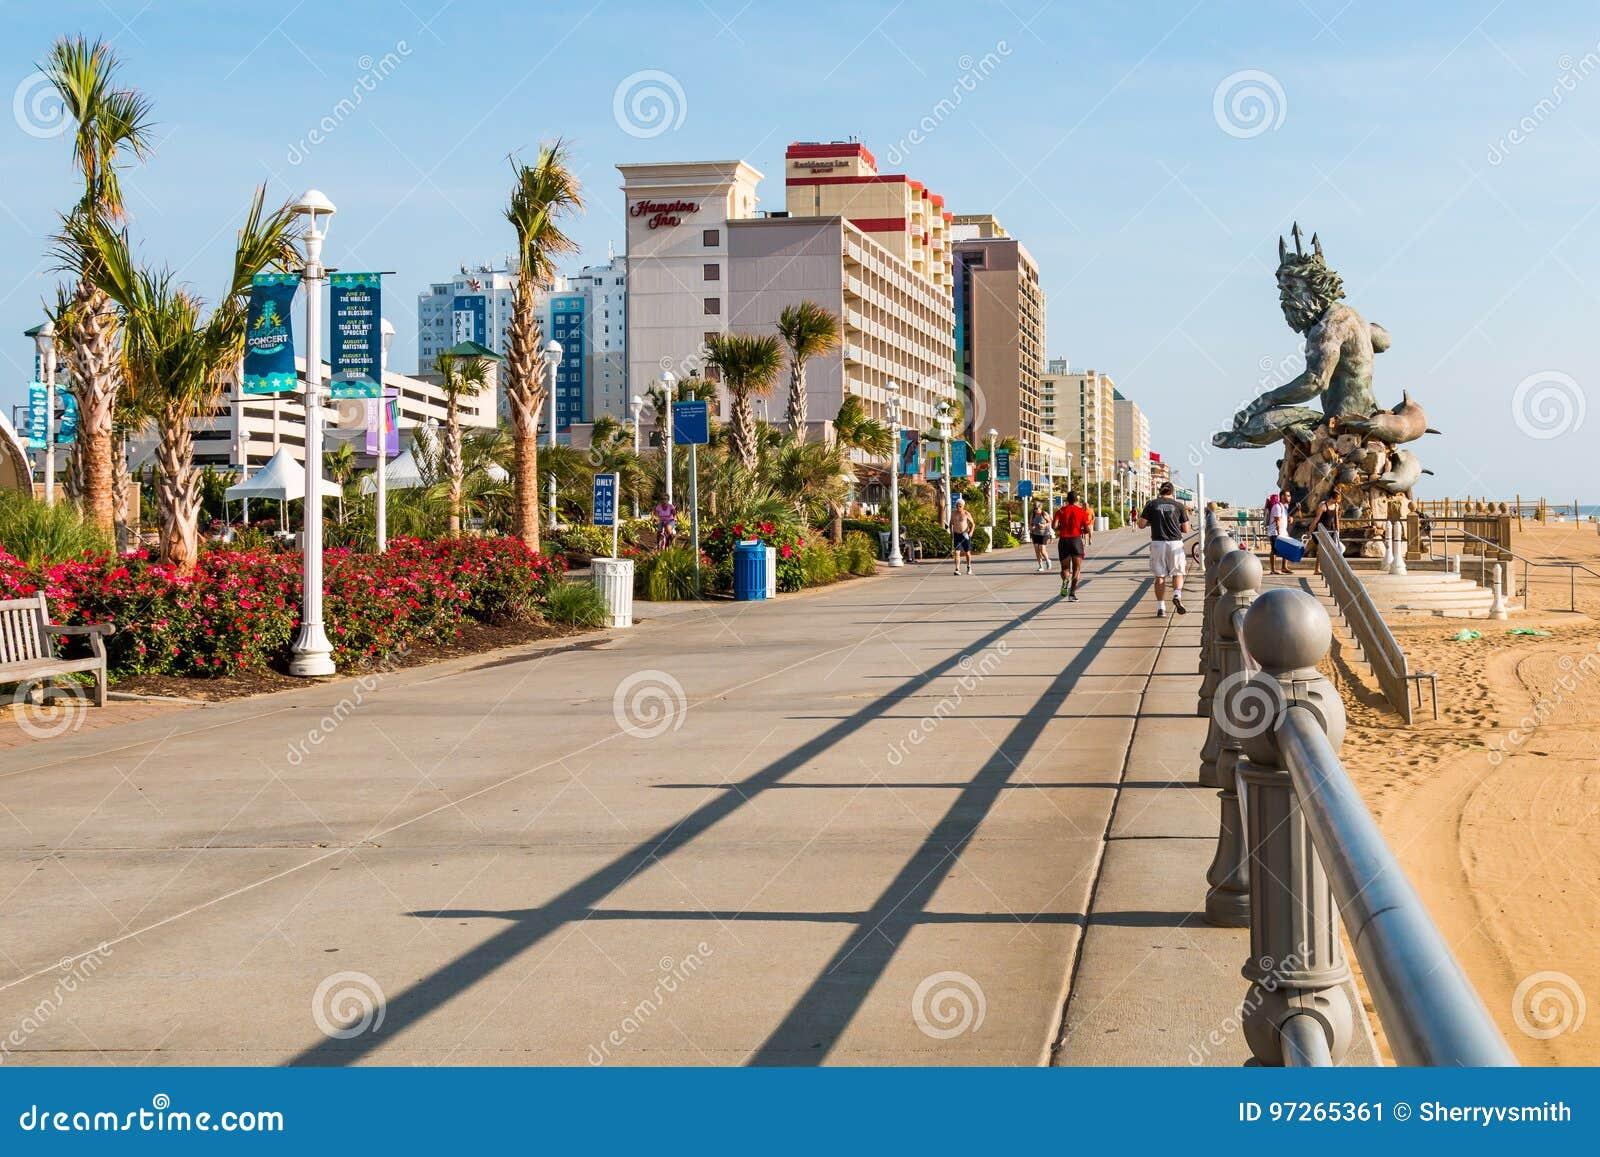 Virginia Beach Resort And Oceanfront Boardwalk Editorial Photo